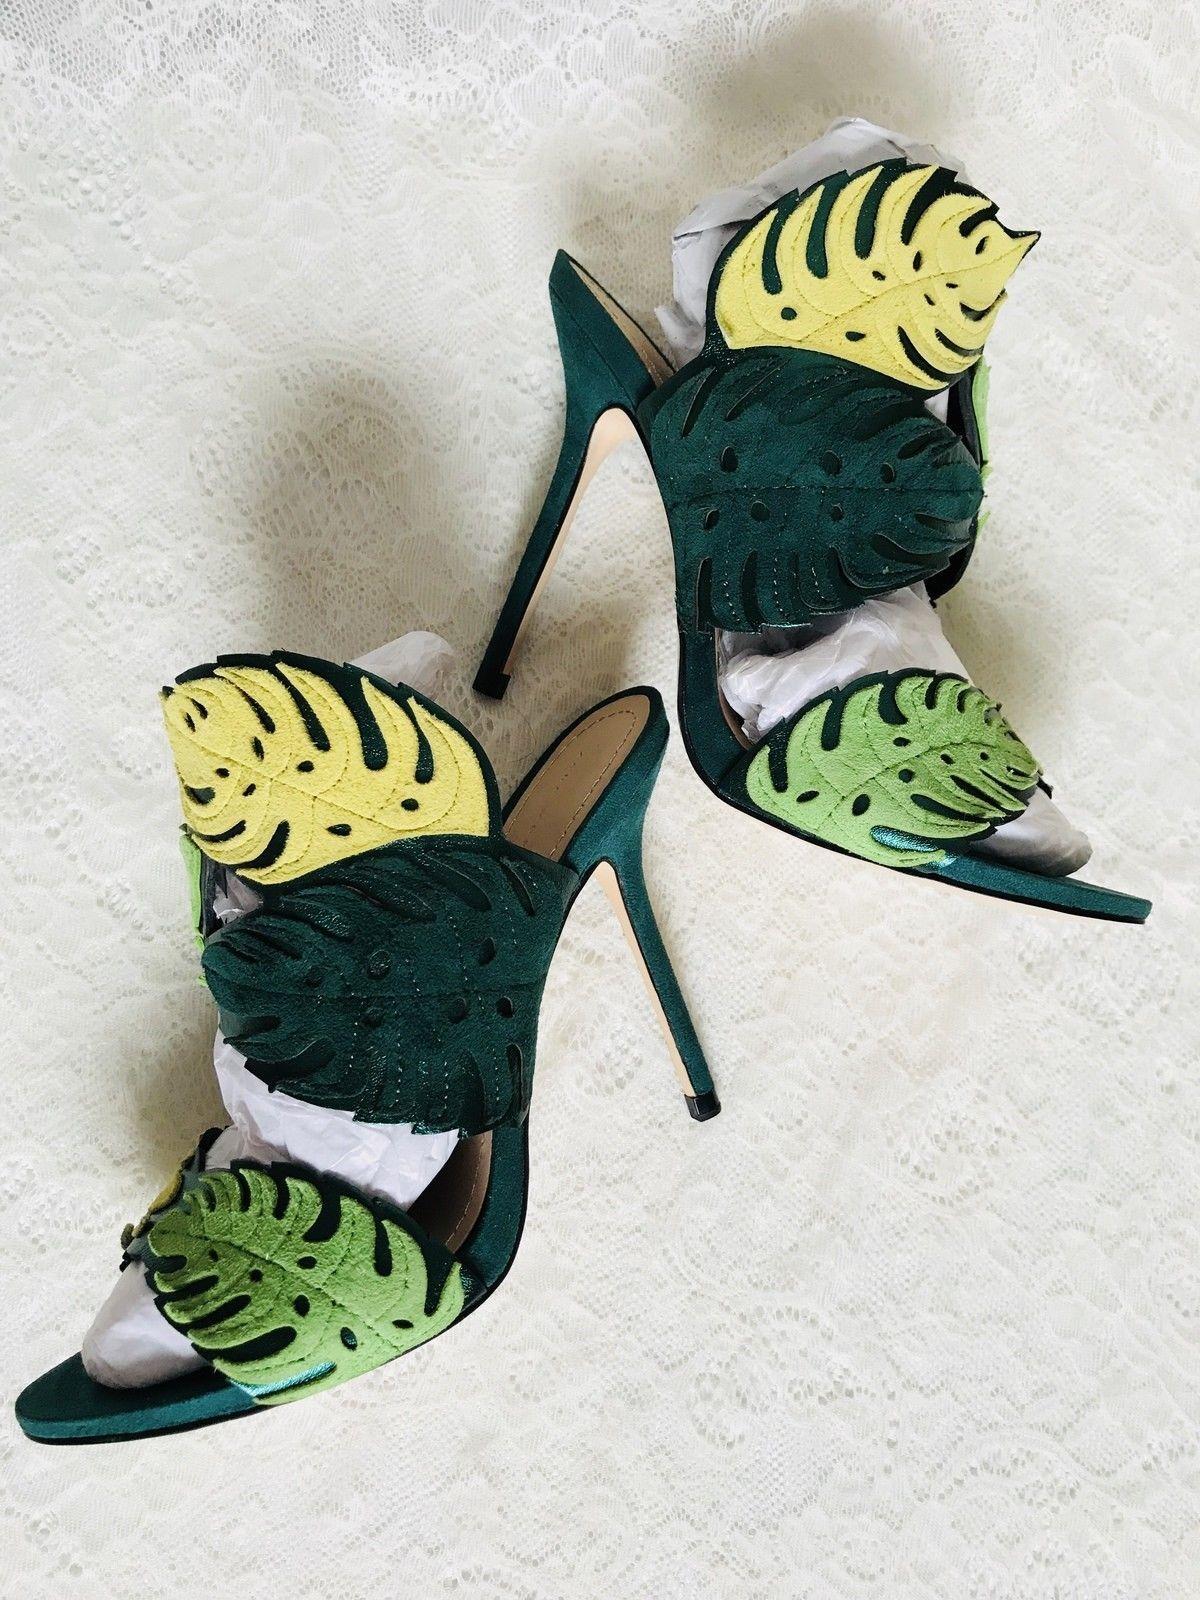 139 Zara WRAP-AROUND LEATHER LEAF SANDALS heels-green yellow-size 5-NEW